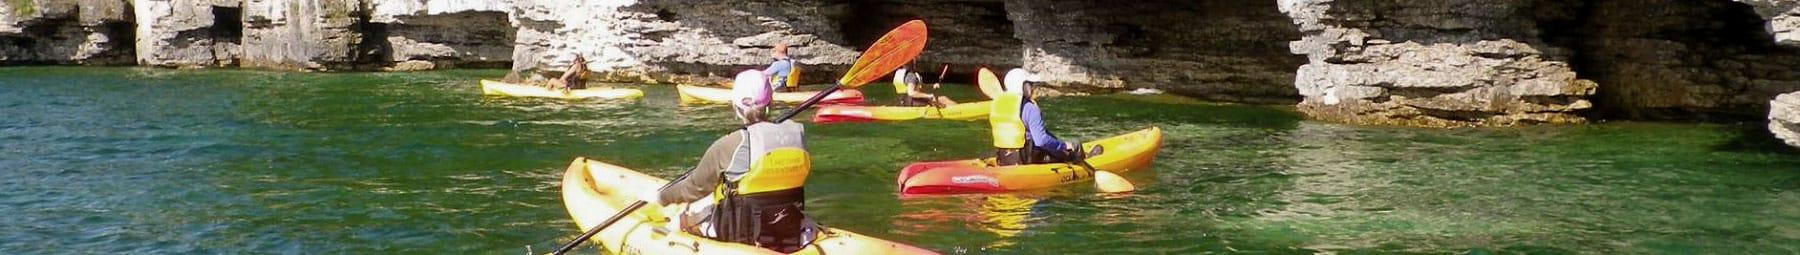 kayak cave tour door county